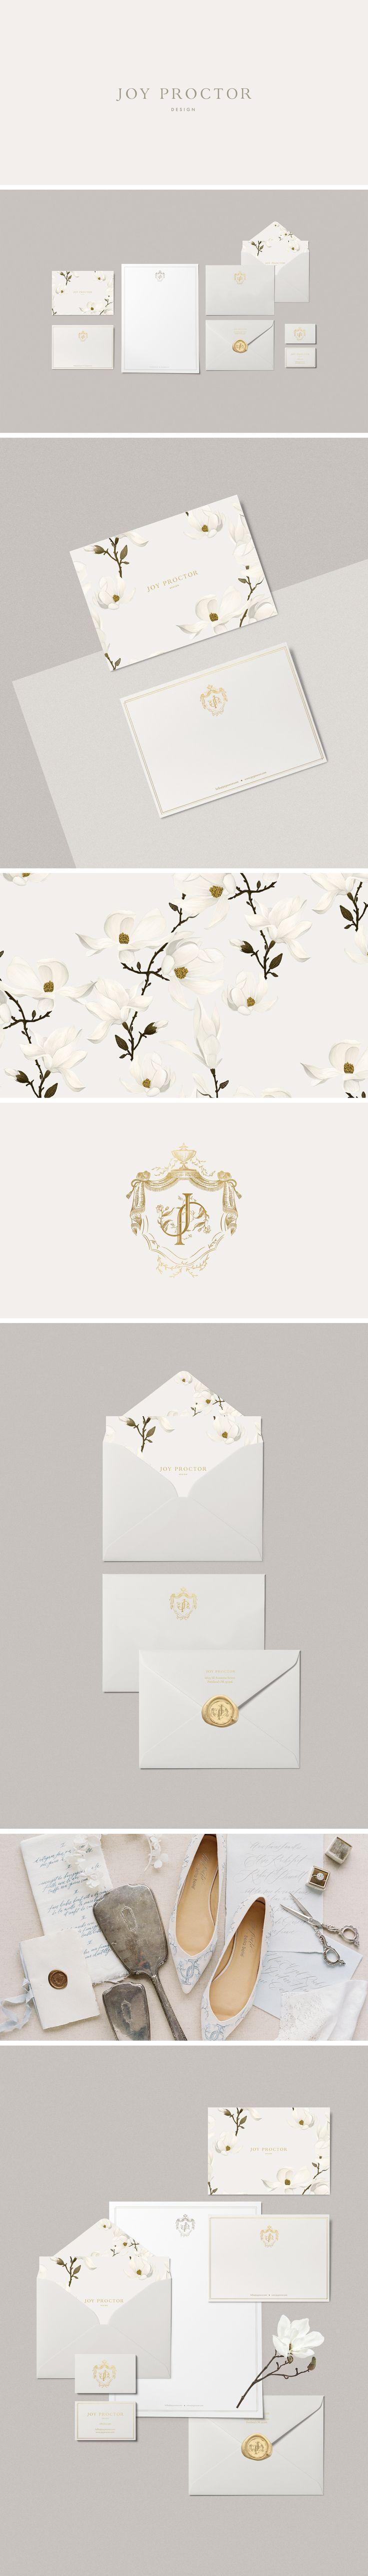 Joy Proctor brand identity designed by Cocorrina